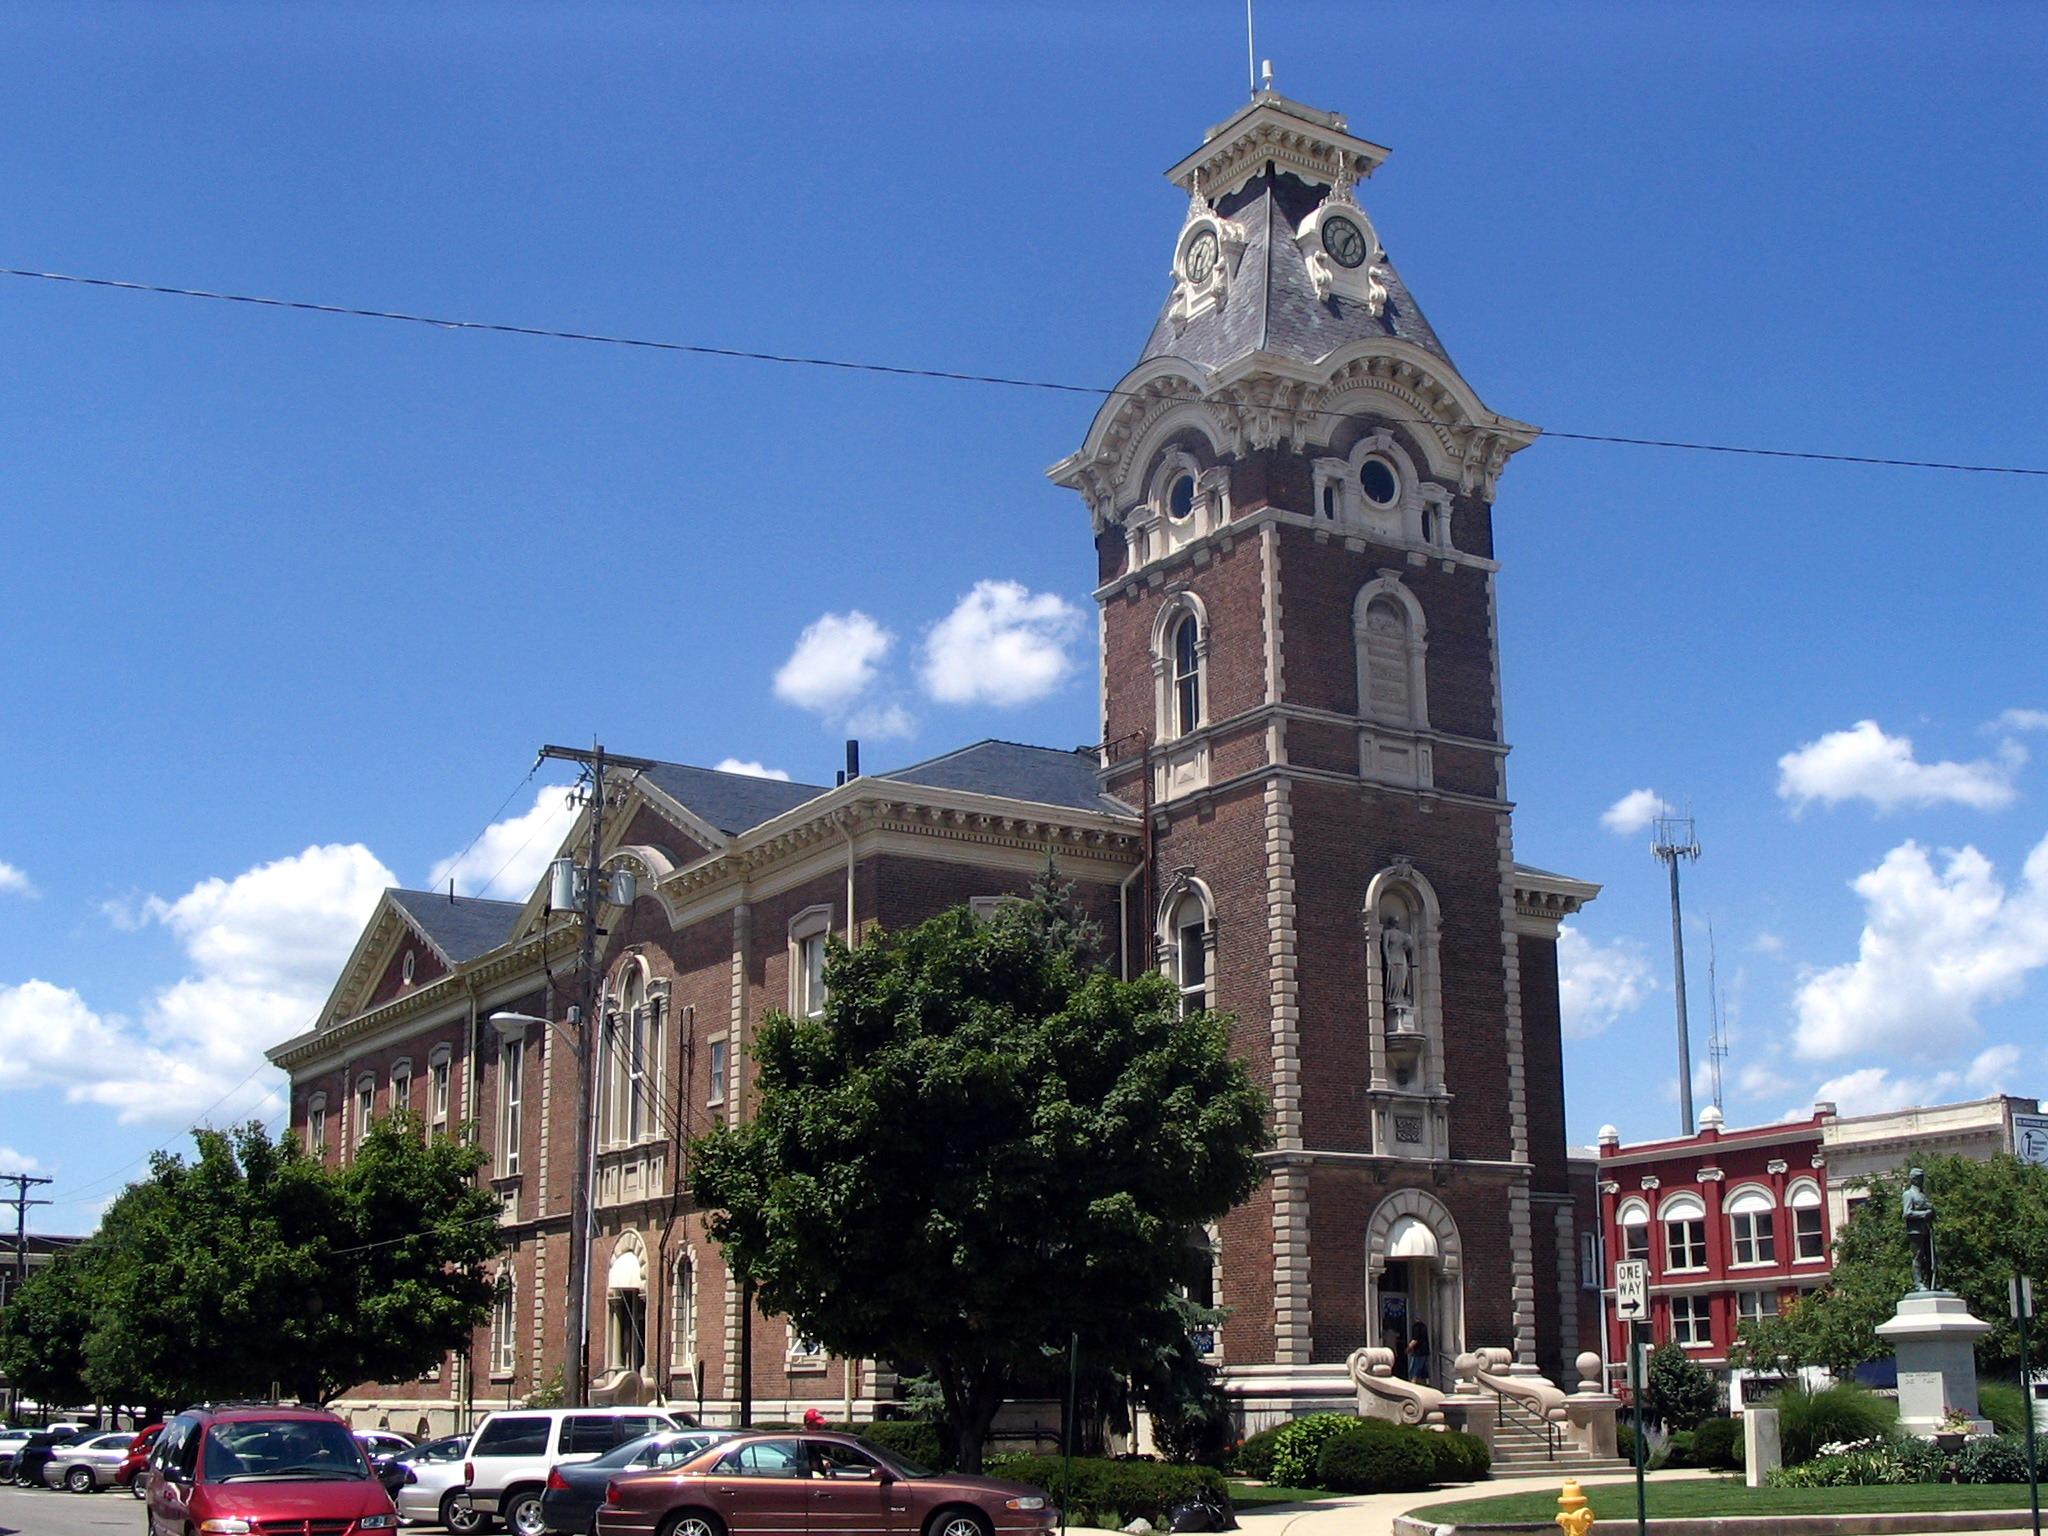 Indiana henry county shirley - Indiana Henry County